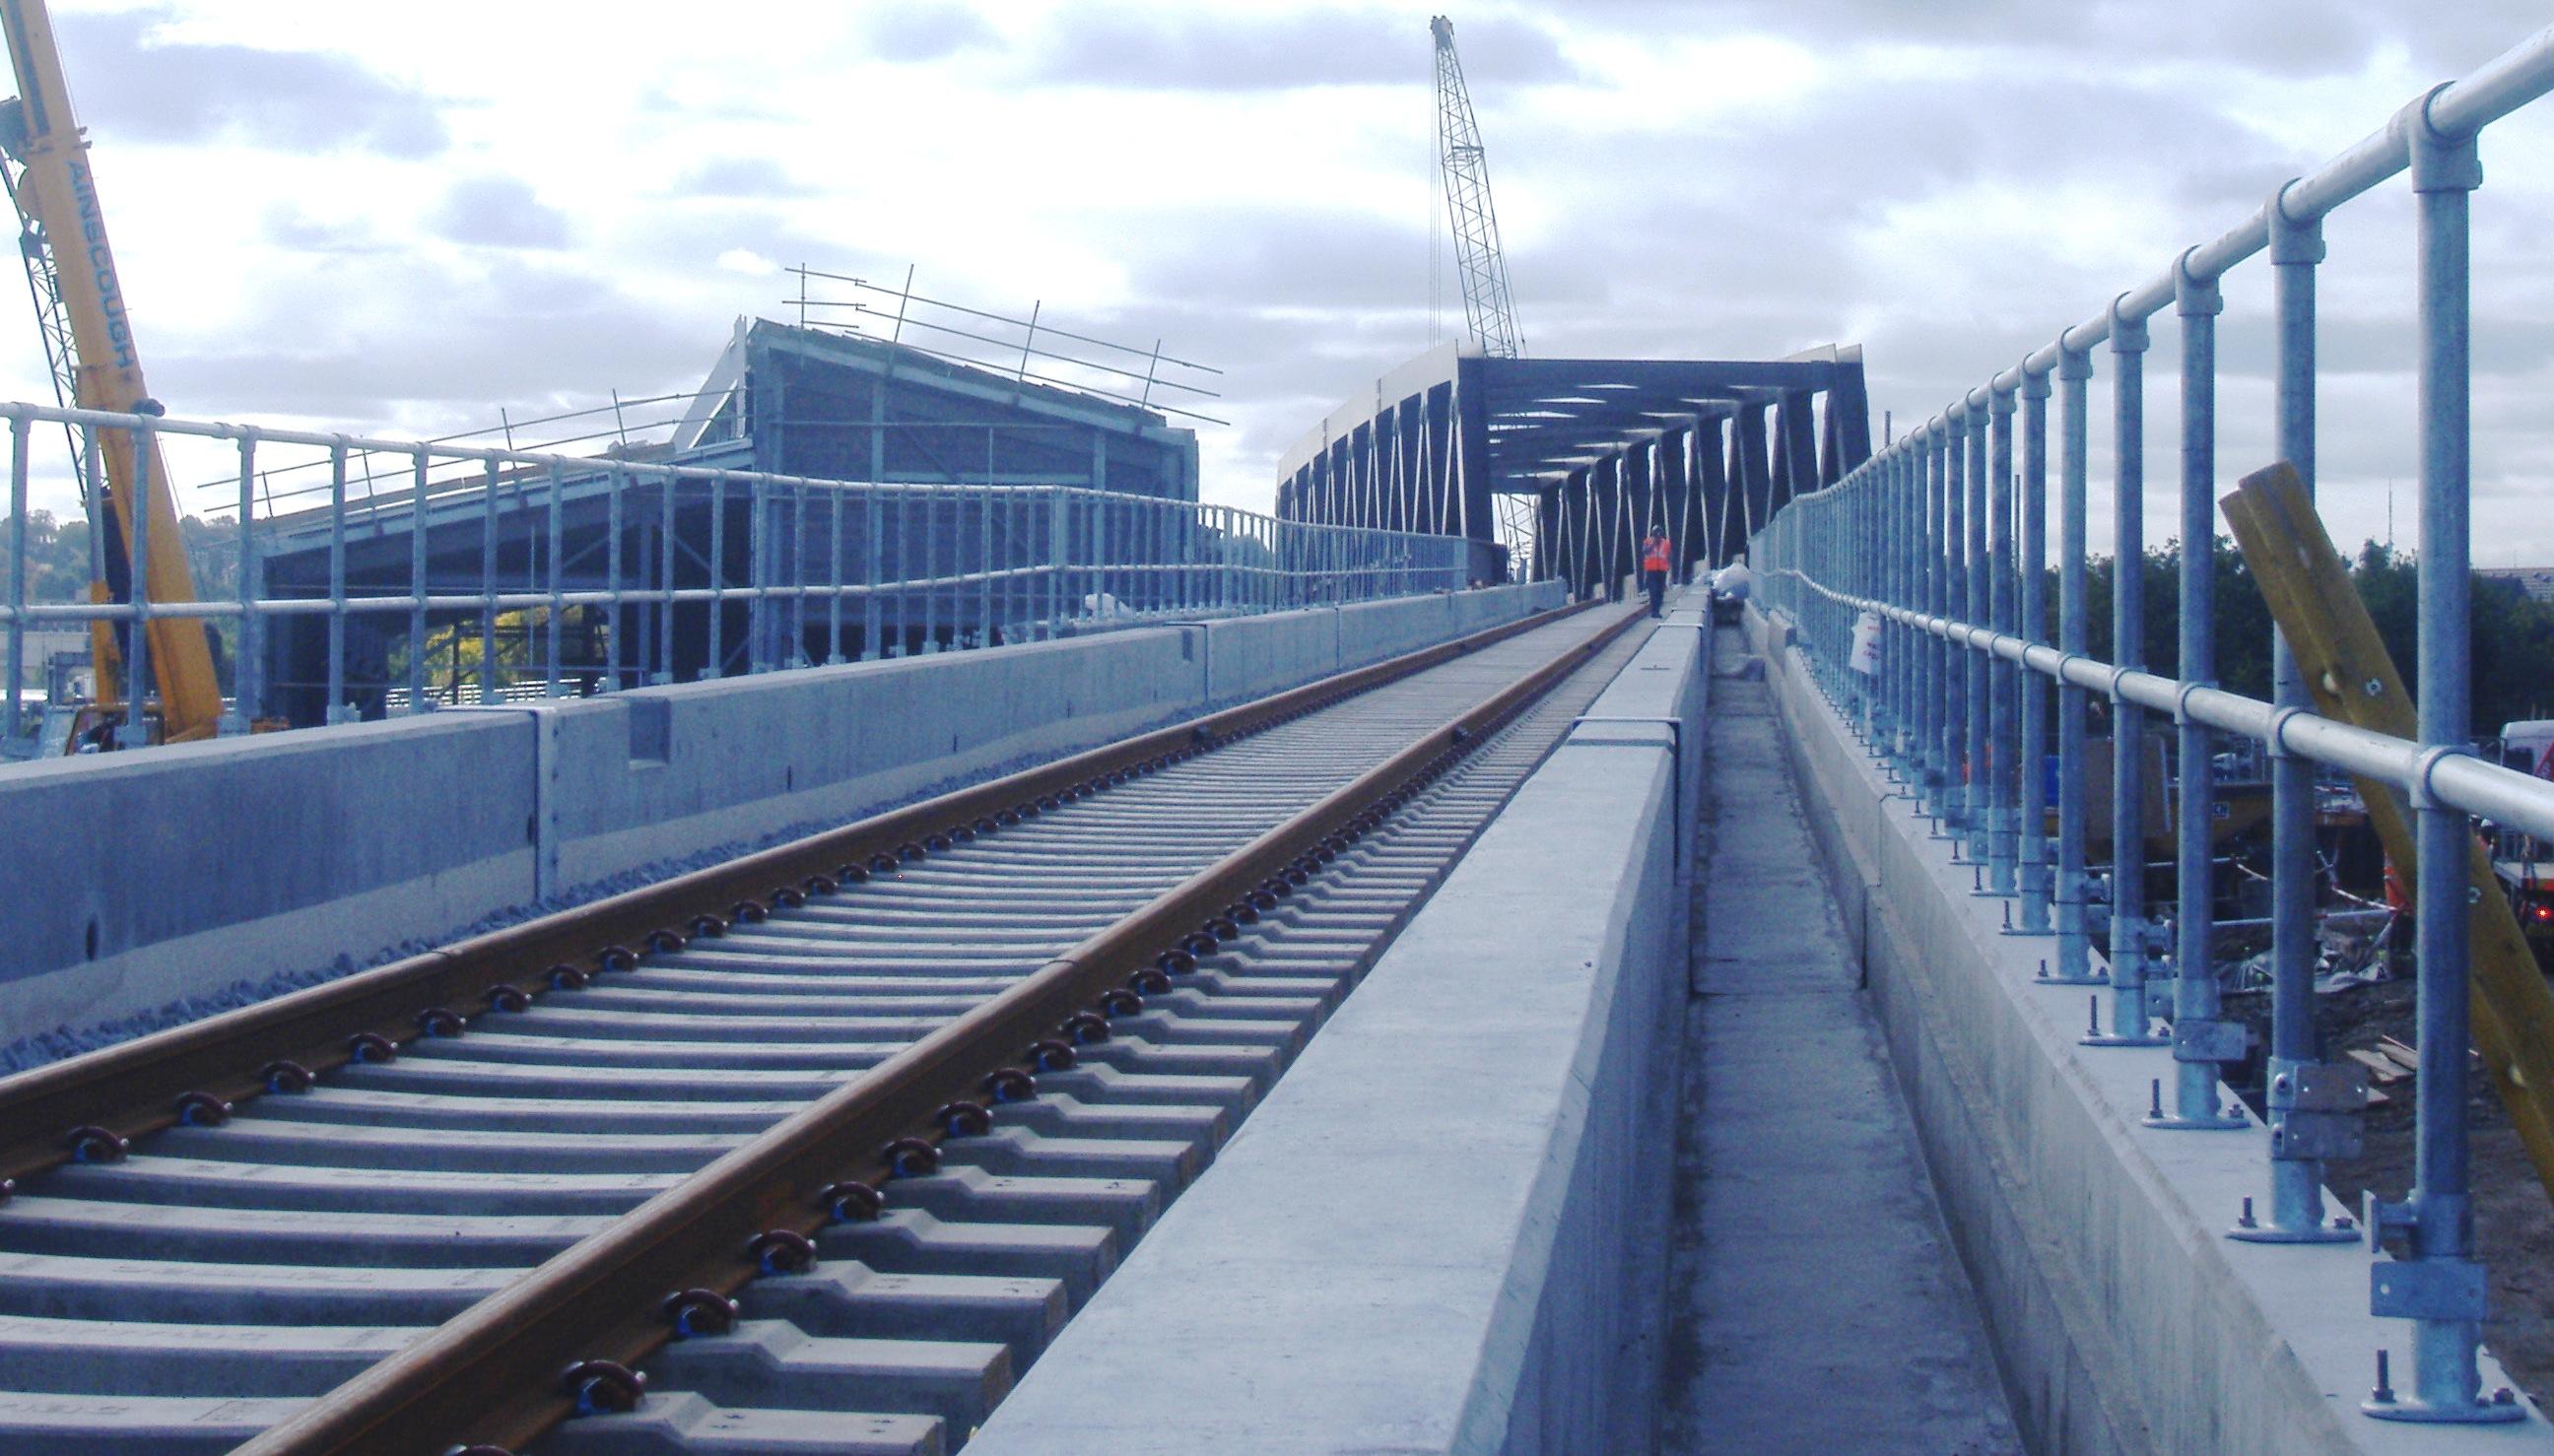 BALFOUR_BEATTY_EAST_LONDON_RAILWAY_LINE_%288%29.jpg